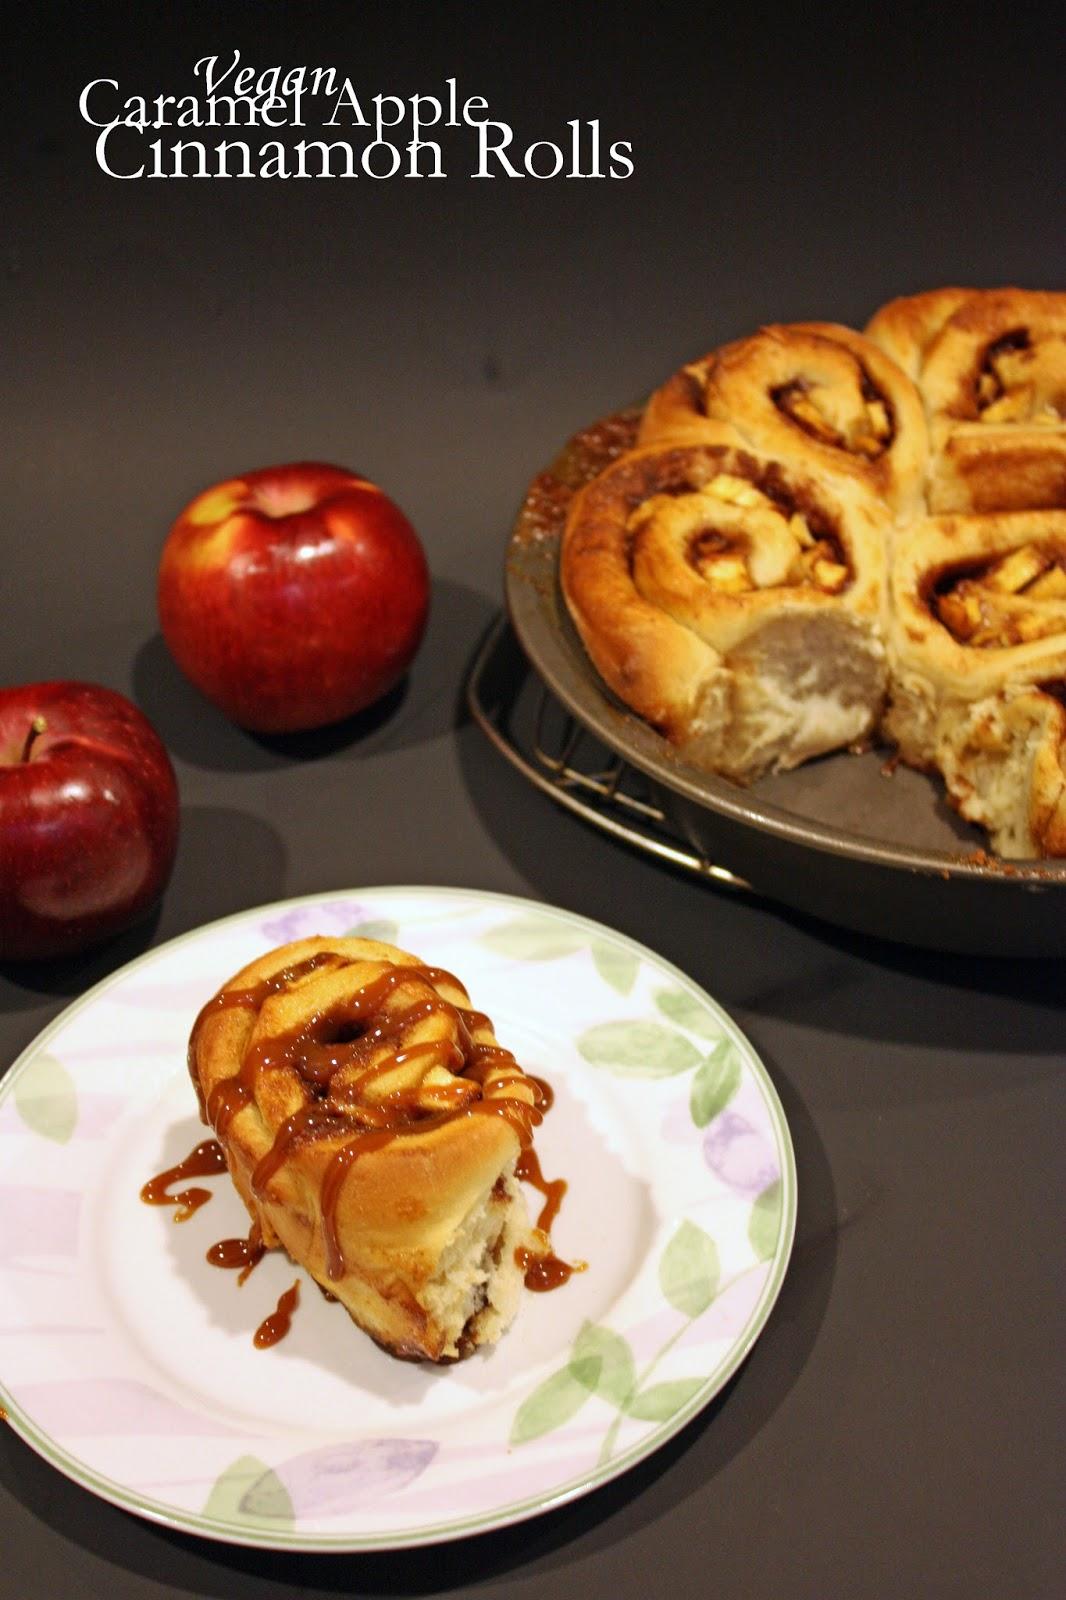 Taste Of Home Fresh Apple Cake With Caramel Sauce